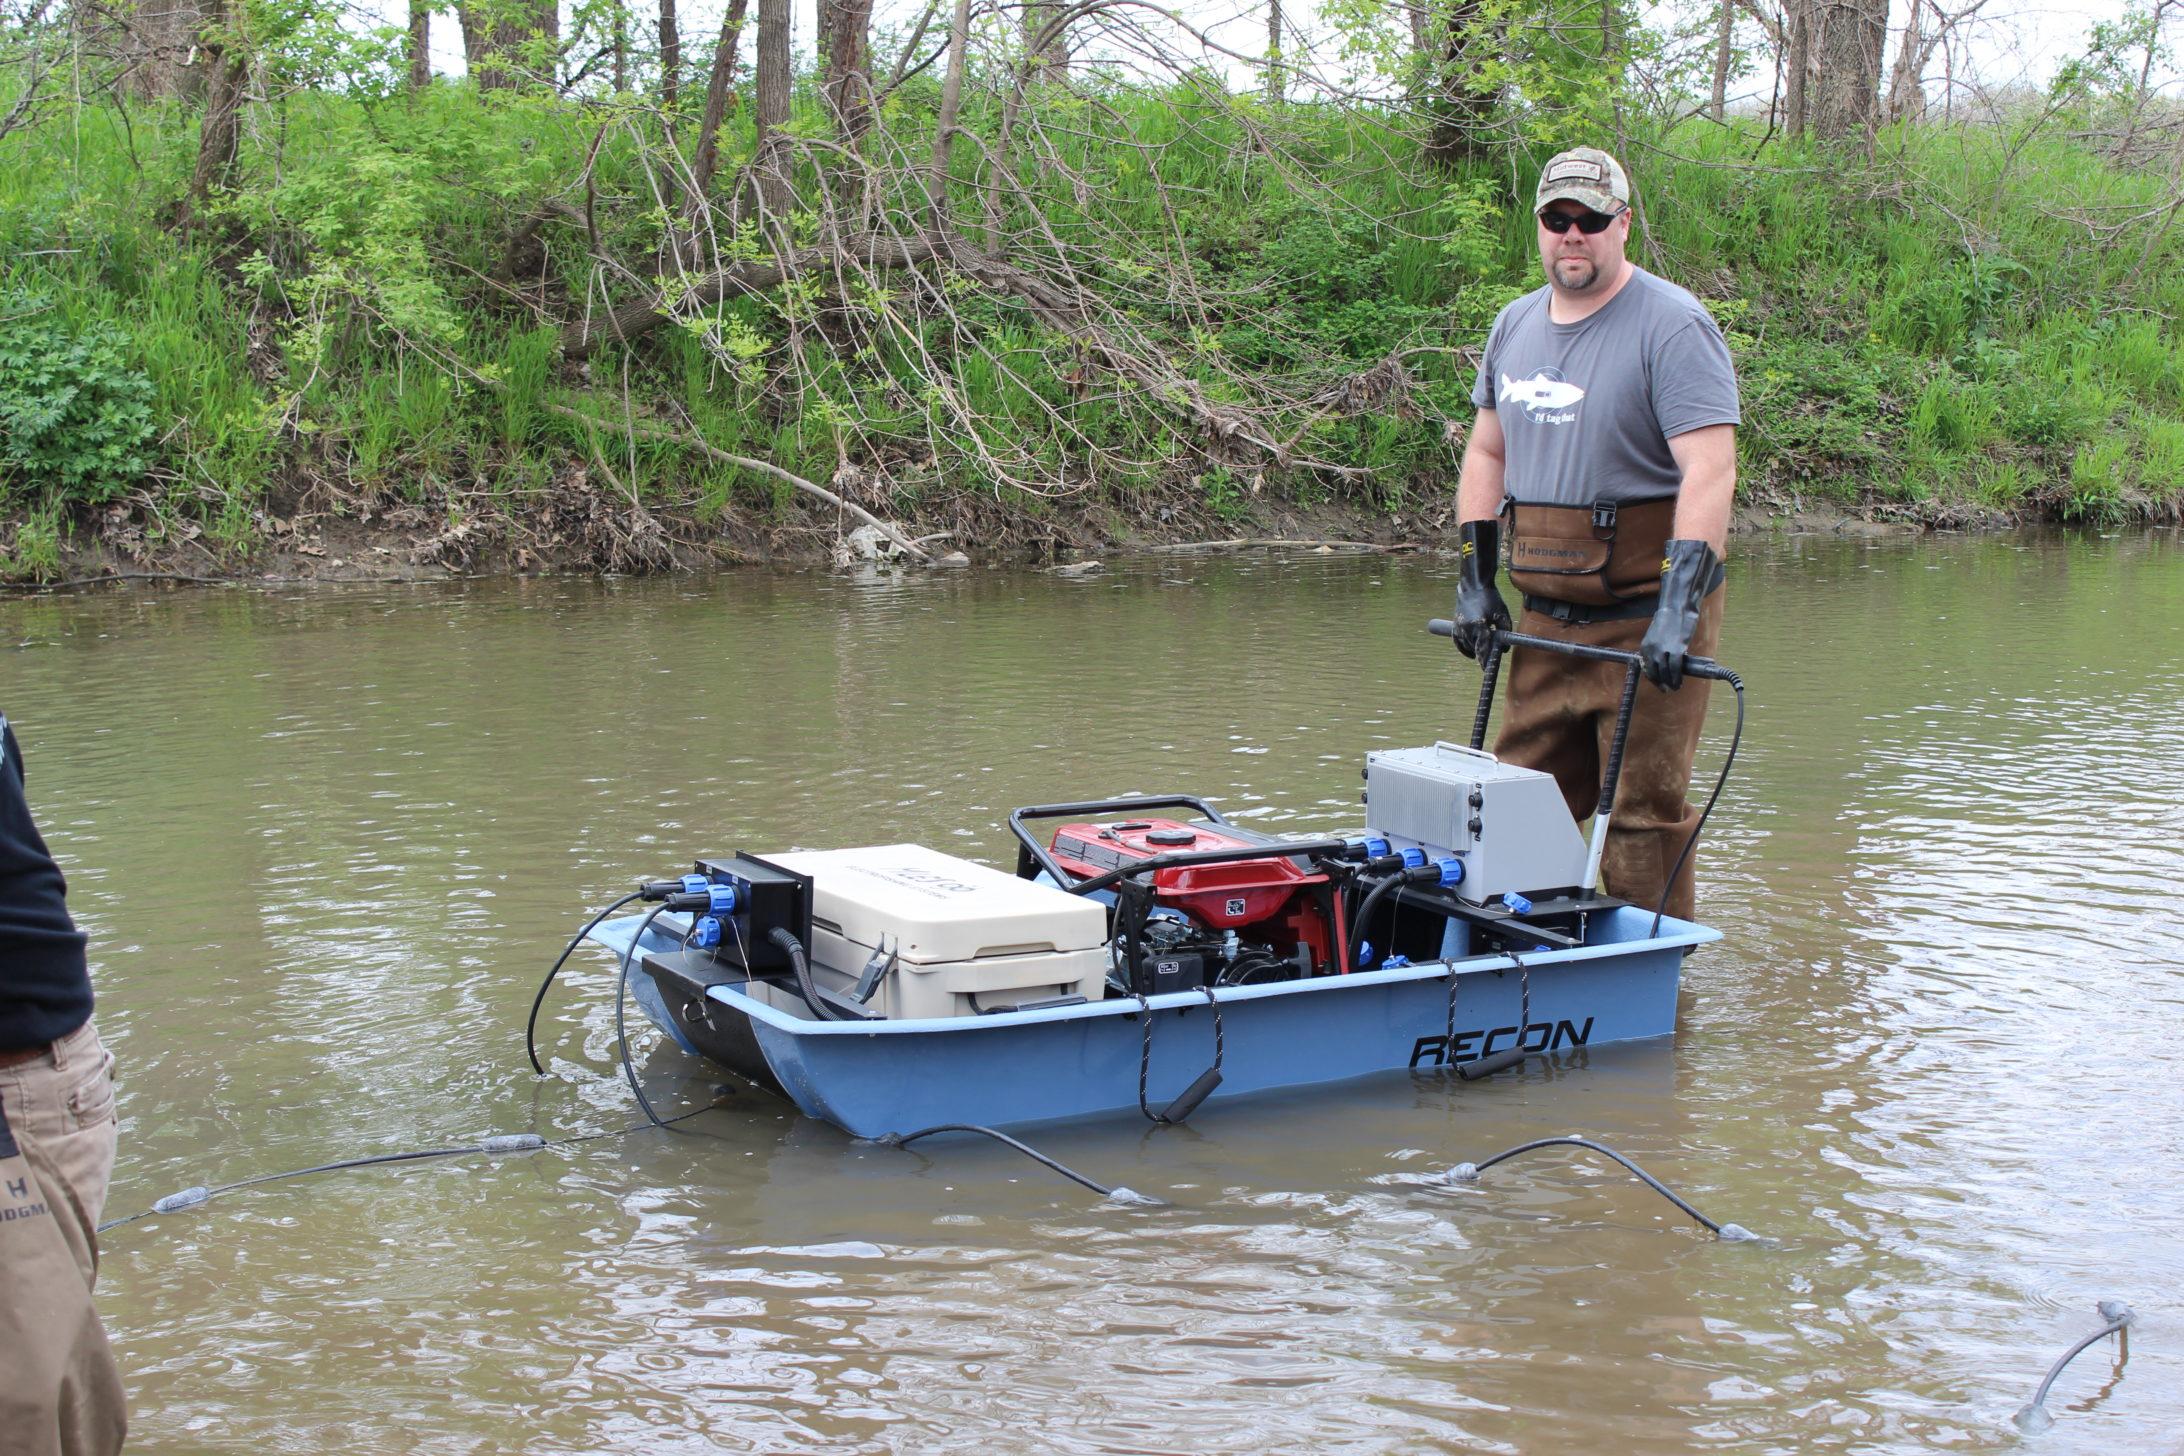 Recon Mini Boat Electrofishing Tote Barge Midwest Lake